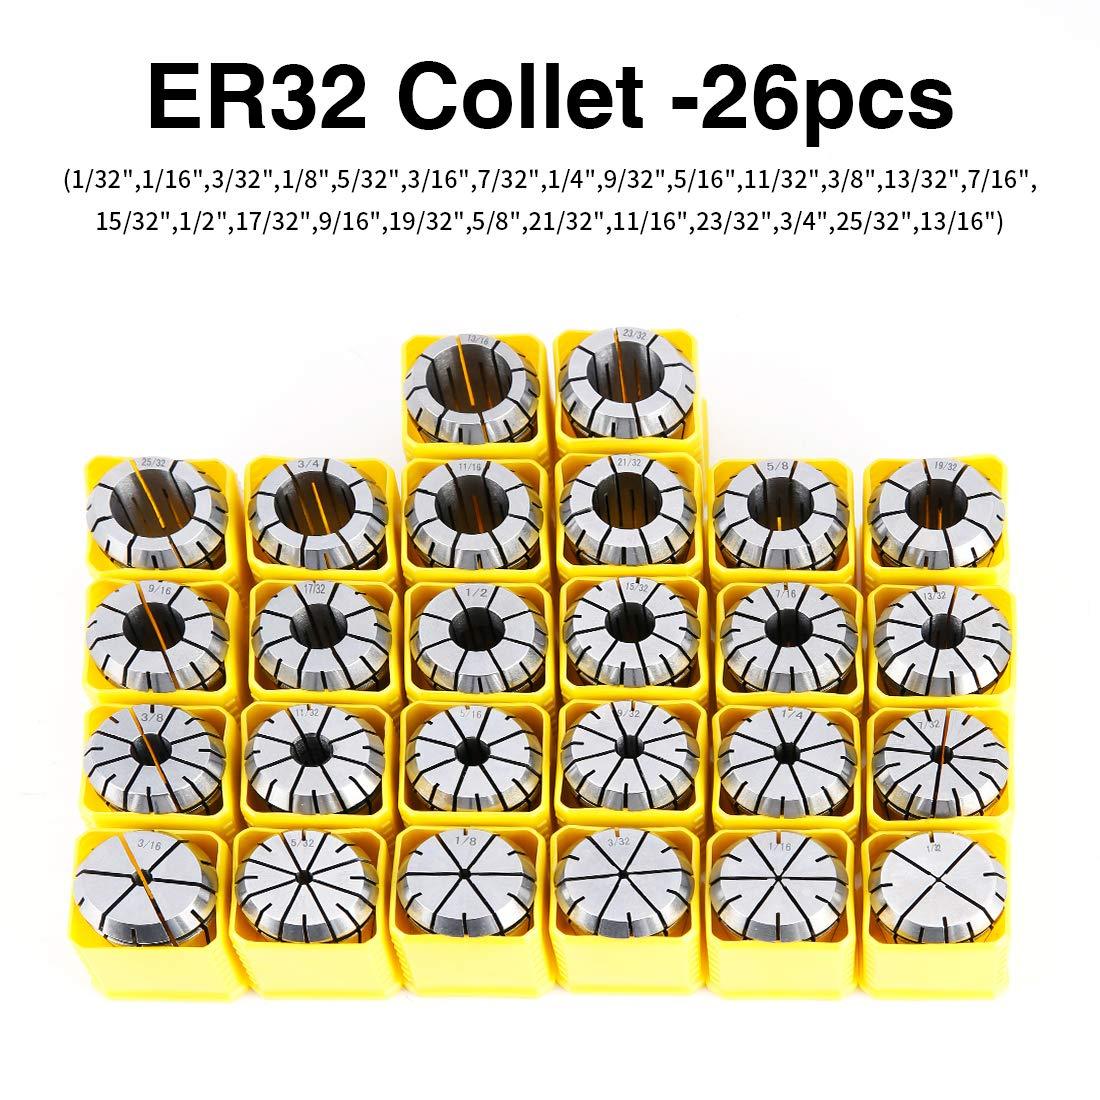 ER32 Spring Collet Set for CNC Engraving Machine and Milling Lathe Tool Workholding Engraving Collets(26PCS) enlarge